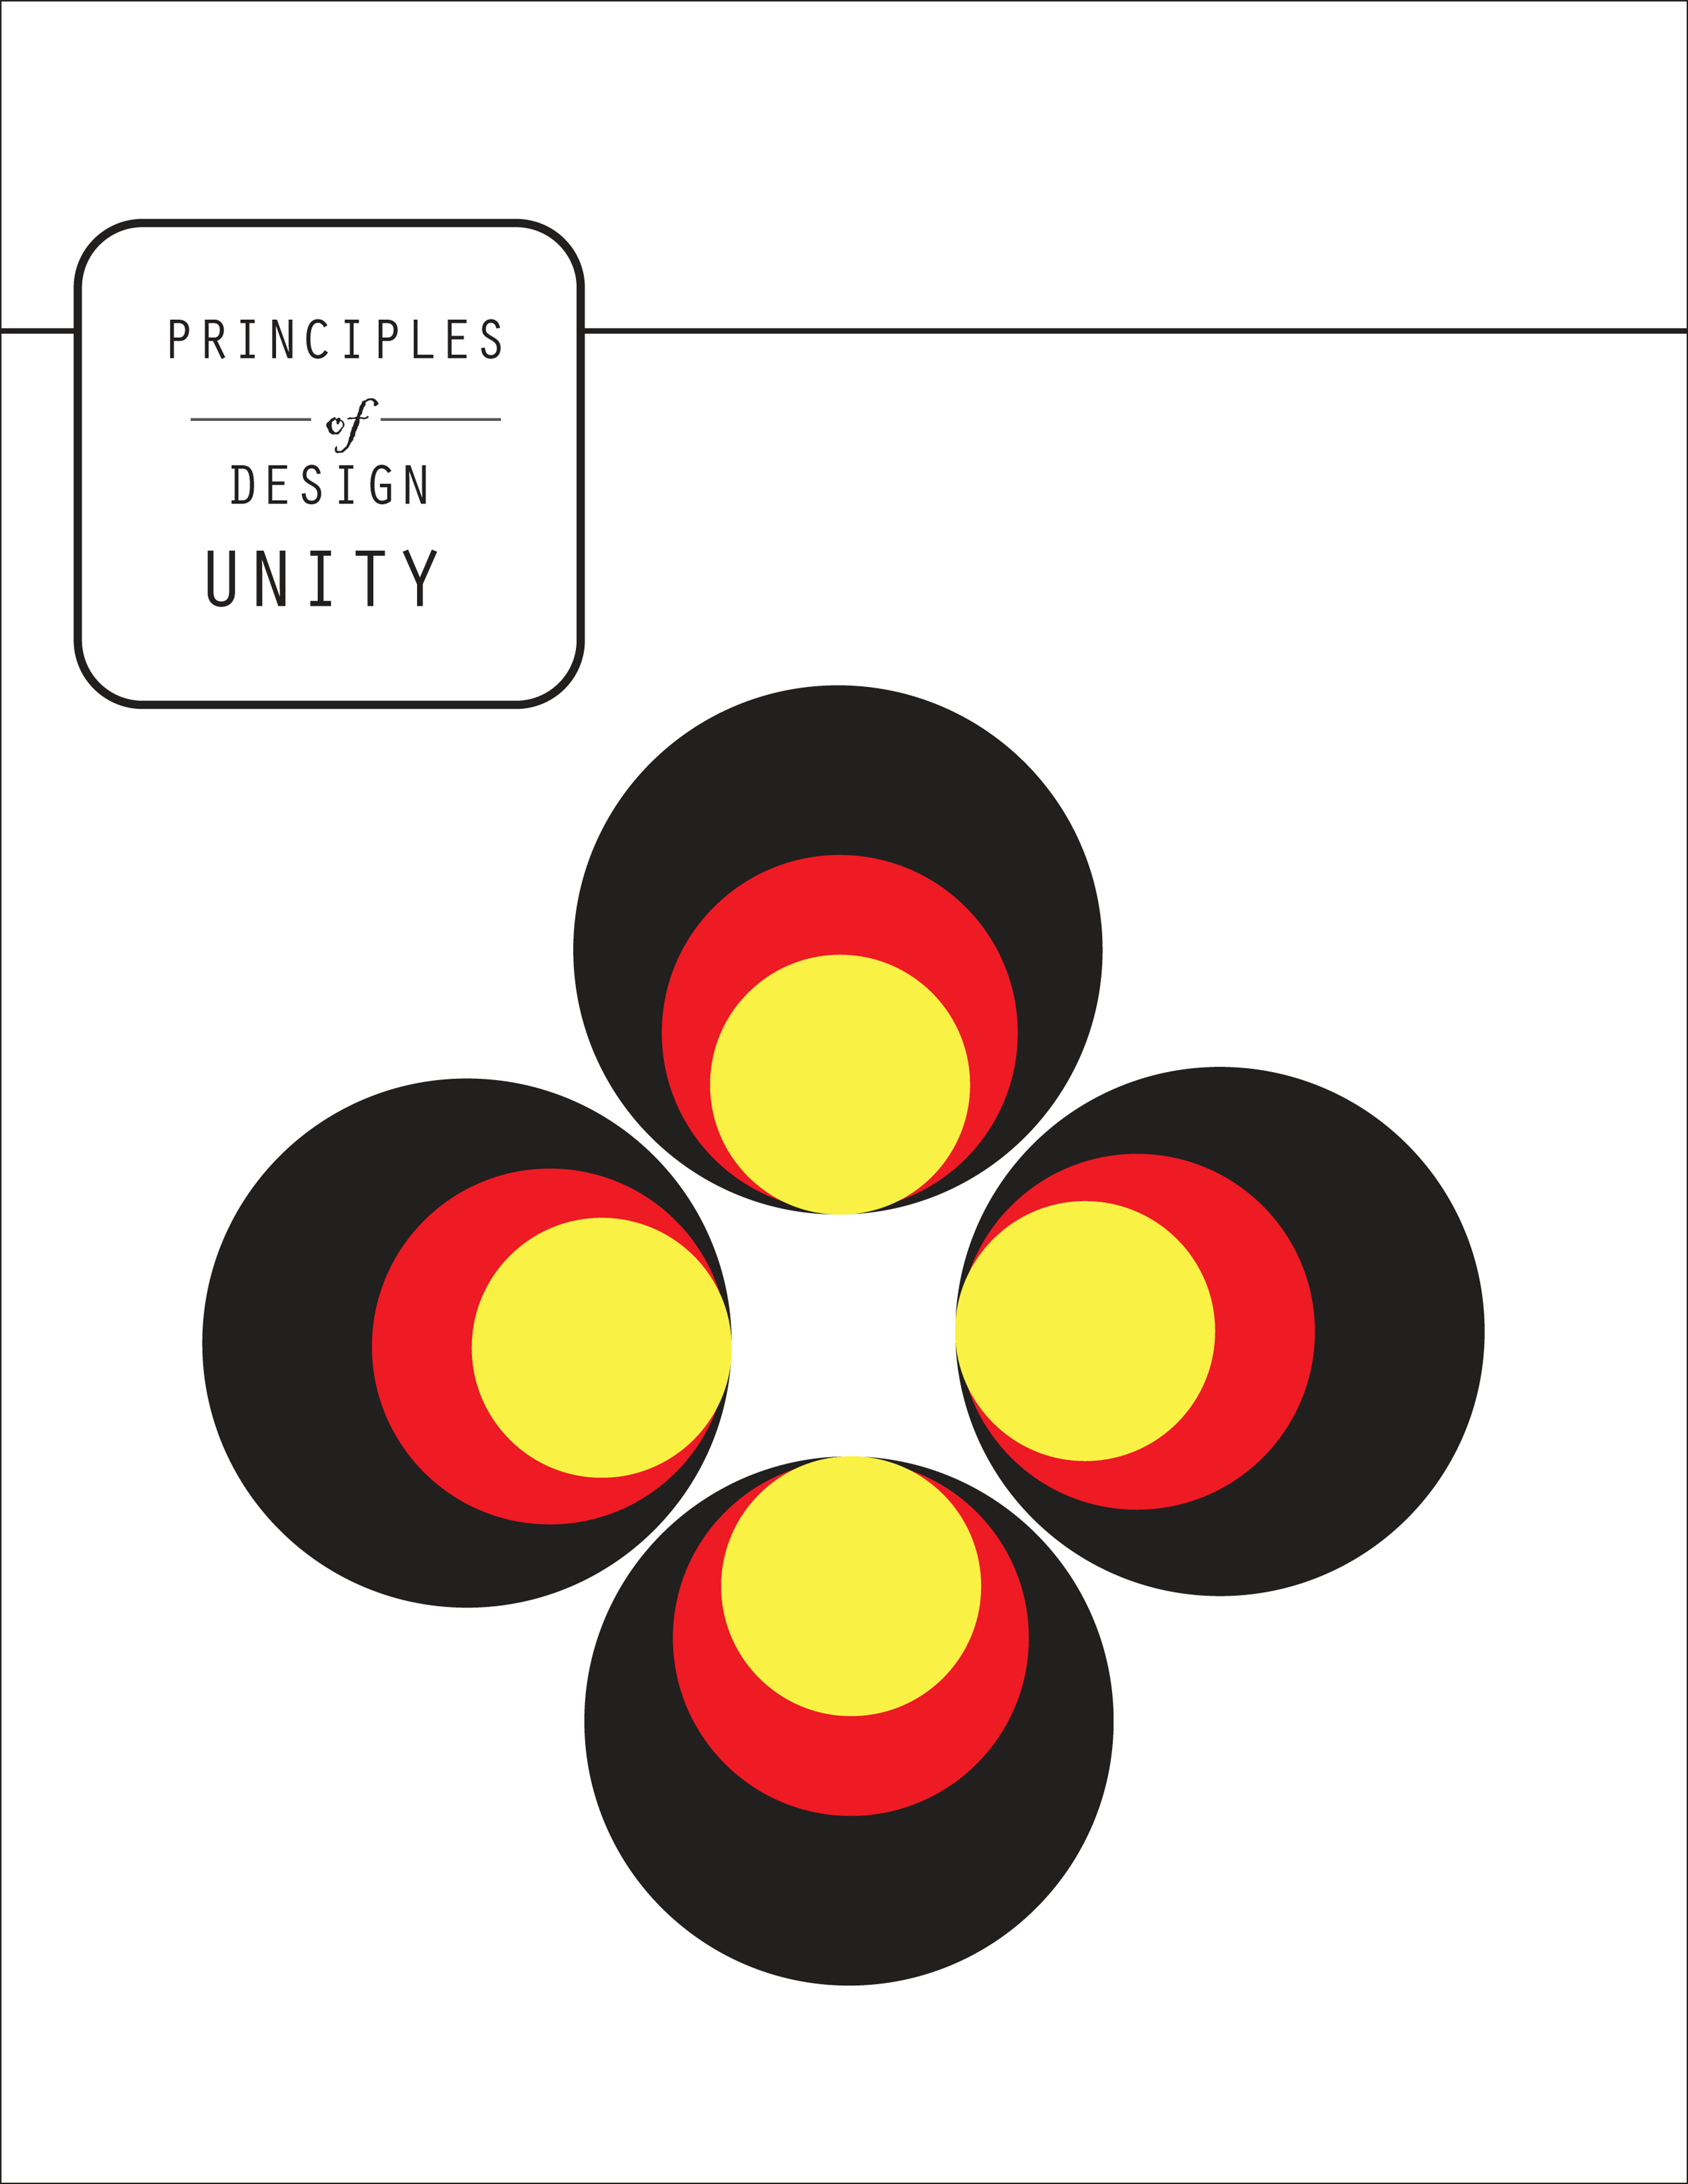 Principle of Design Unity | Principles of Design in 2019 ...